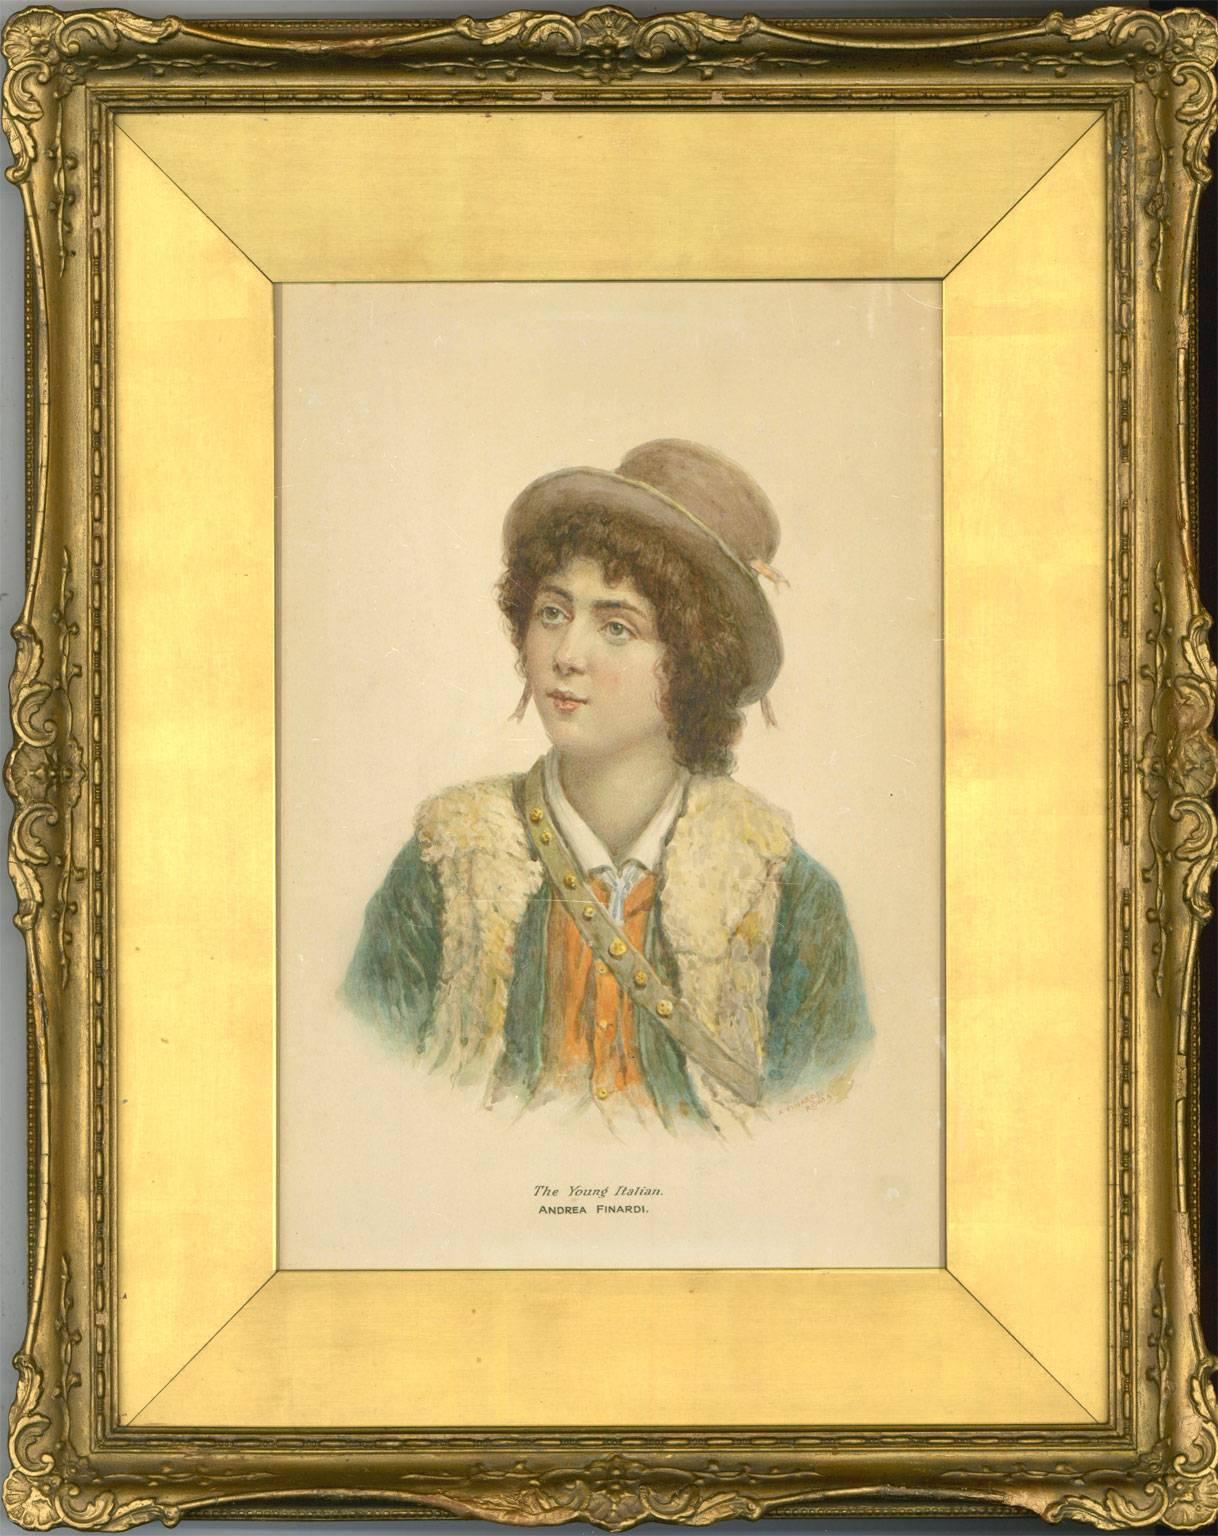 Andrea Finardi - Gilt Framed 19th Century Italian Watercolour, The Young Italian